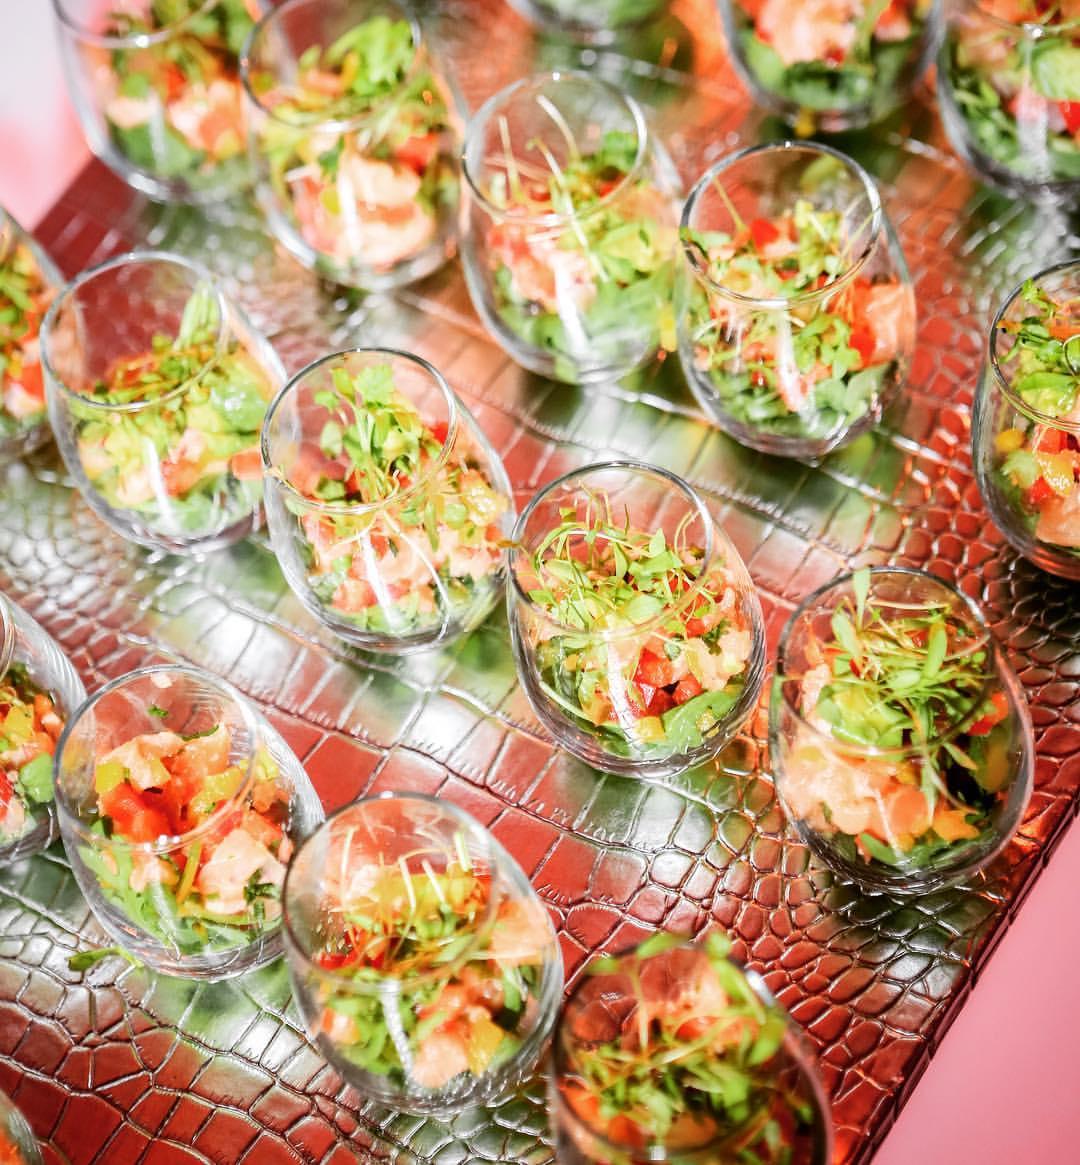 Miami Venue / Miami Catering - Hors D'Oeuvres